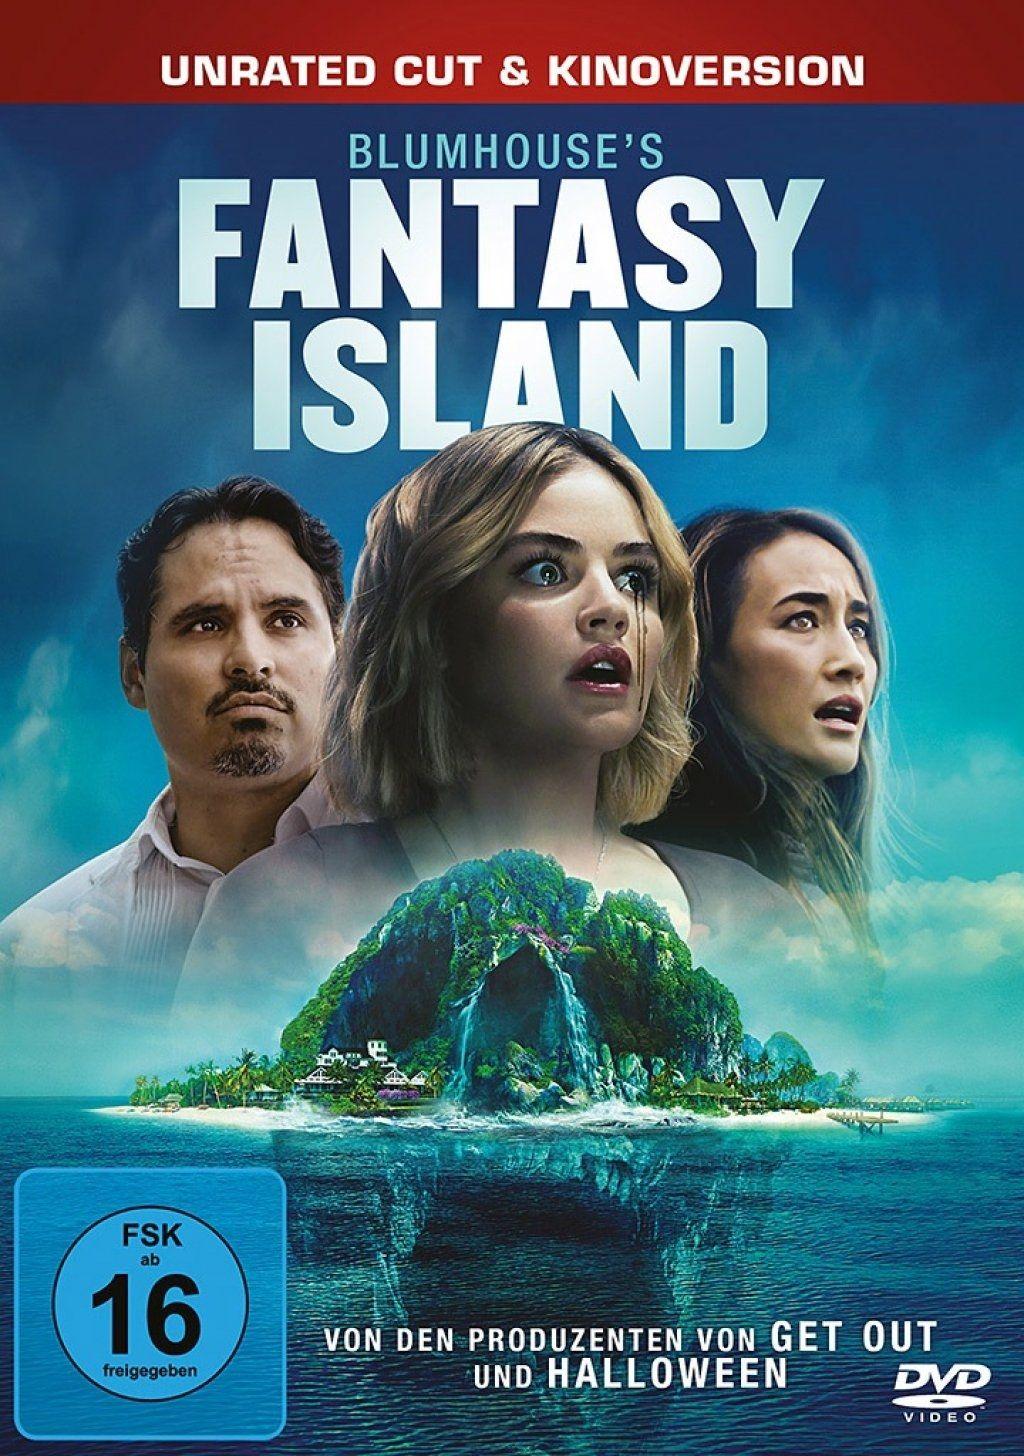 Fantasy Island (Unrated Cut & Kinofassung)